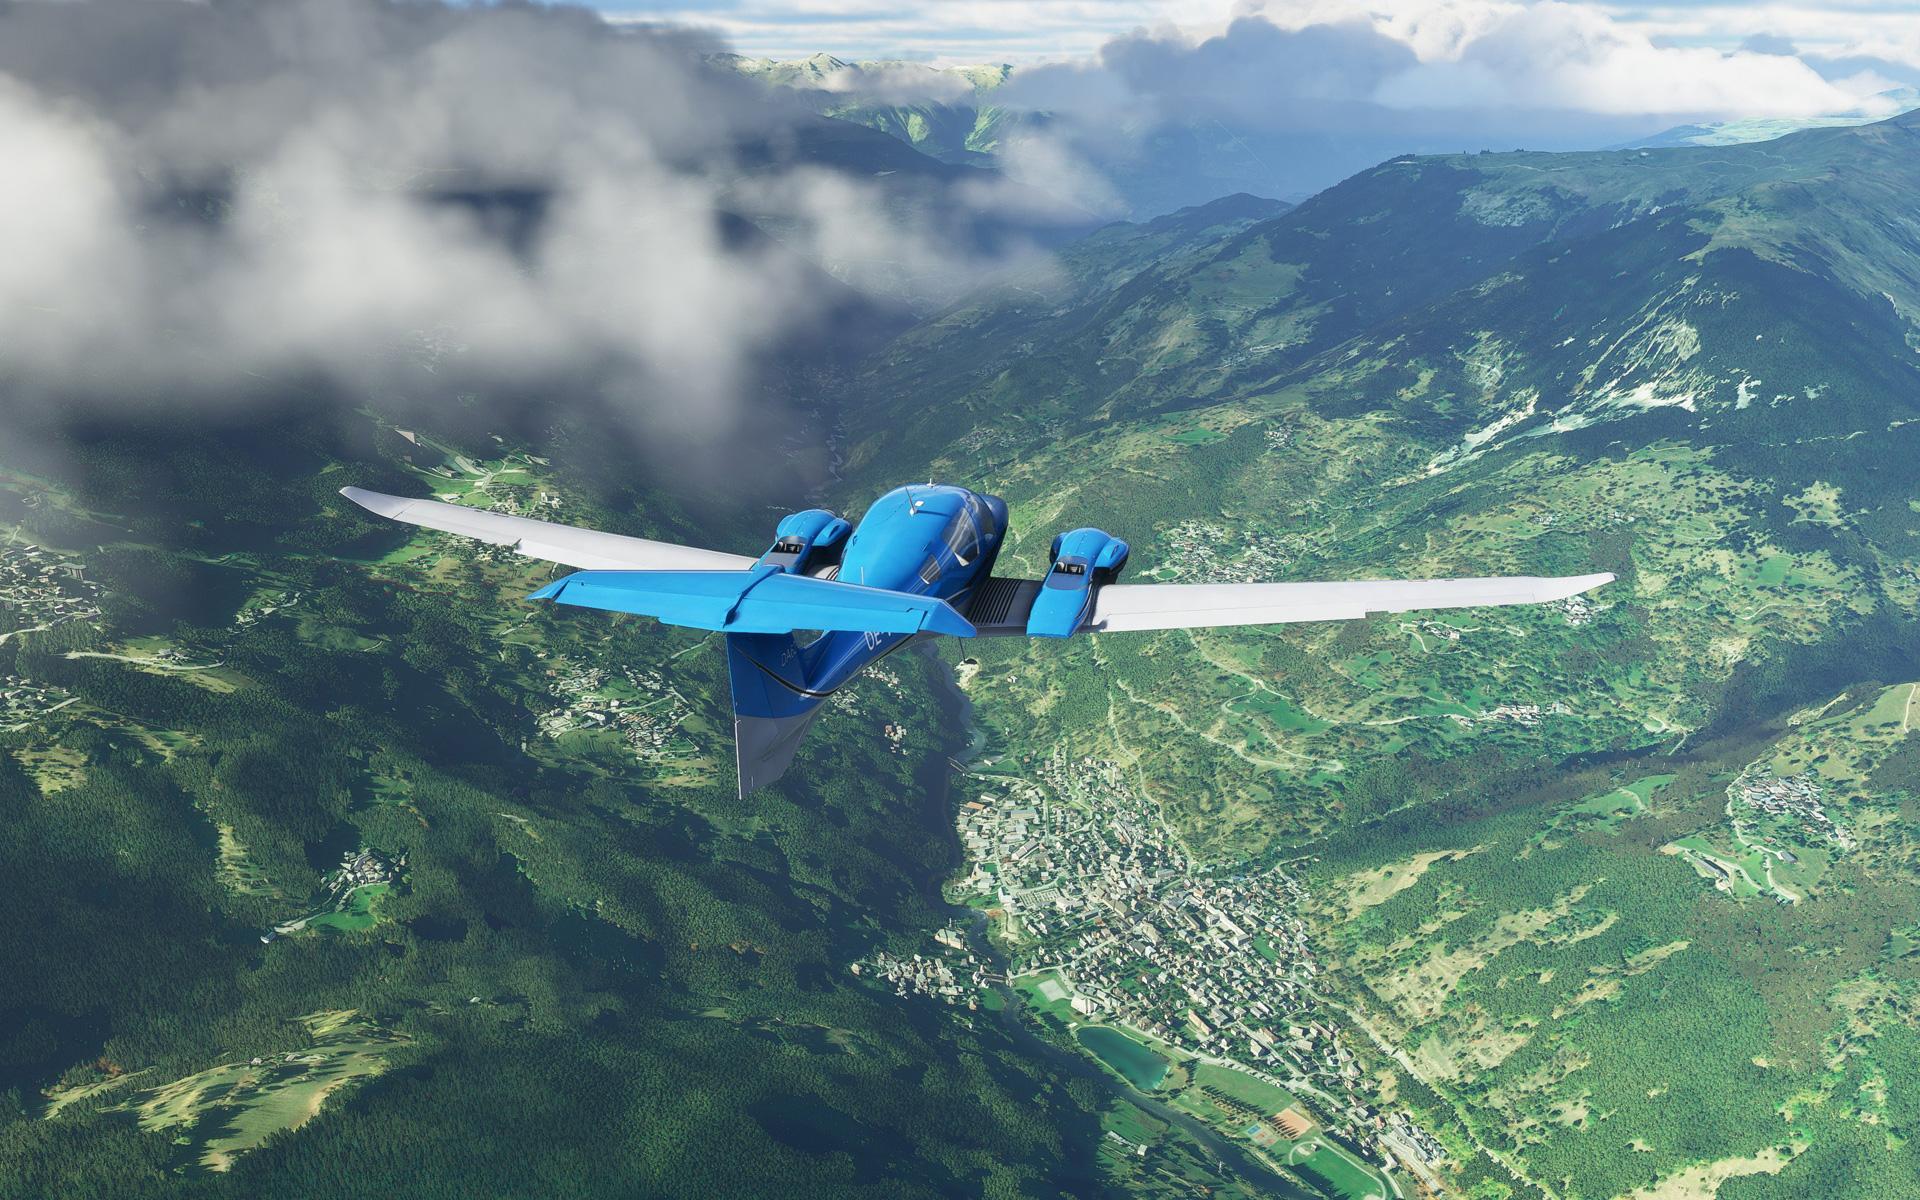 Microsoft Flight Simulator (2020) Wallpaper in 1920x1200